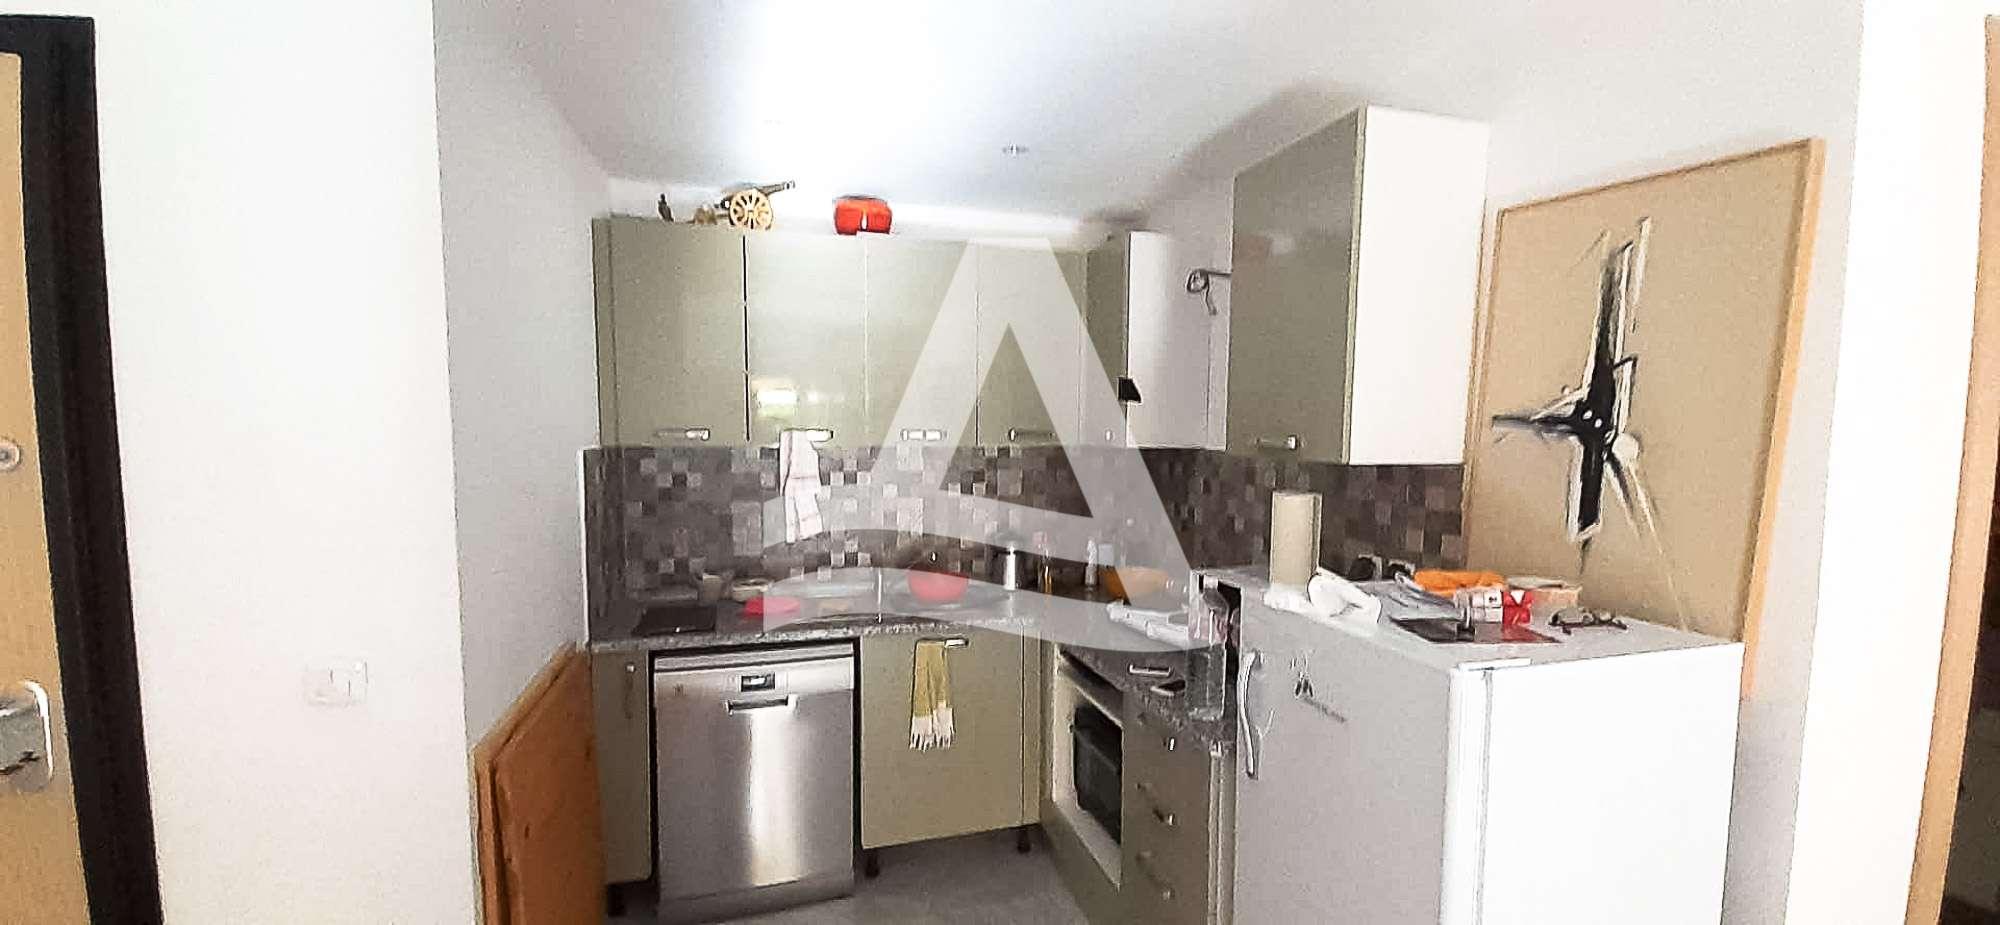 httpss3.amazonaws.comlogimoaws_Arcane_immobilière_la_Marsa-_location_-_vente_la_marsa_10_sur_12_1574441790513